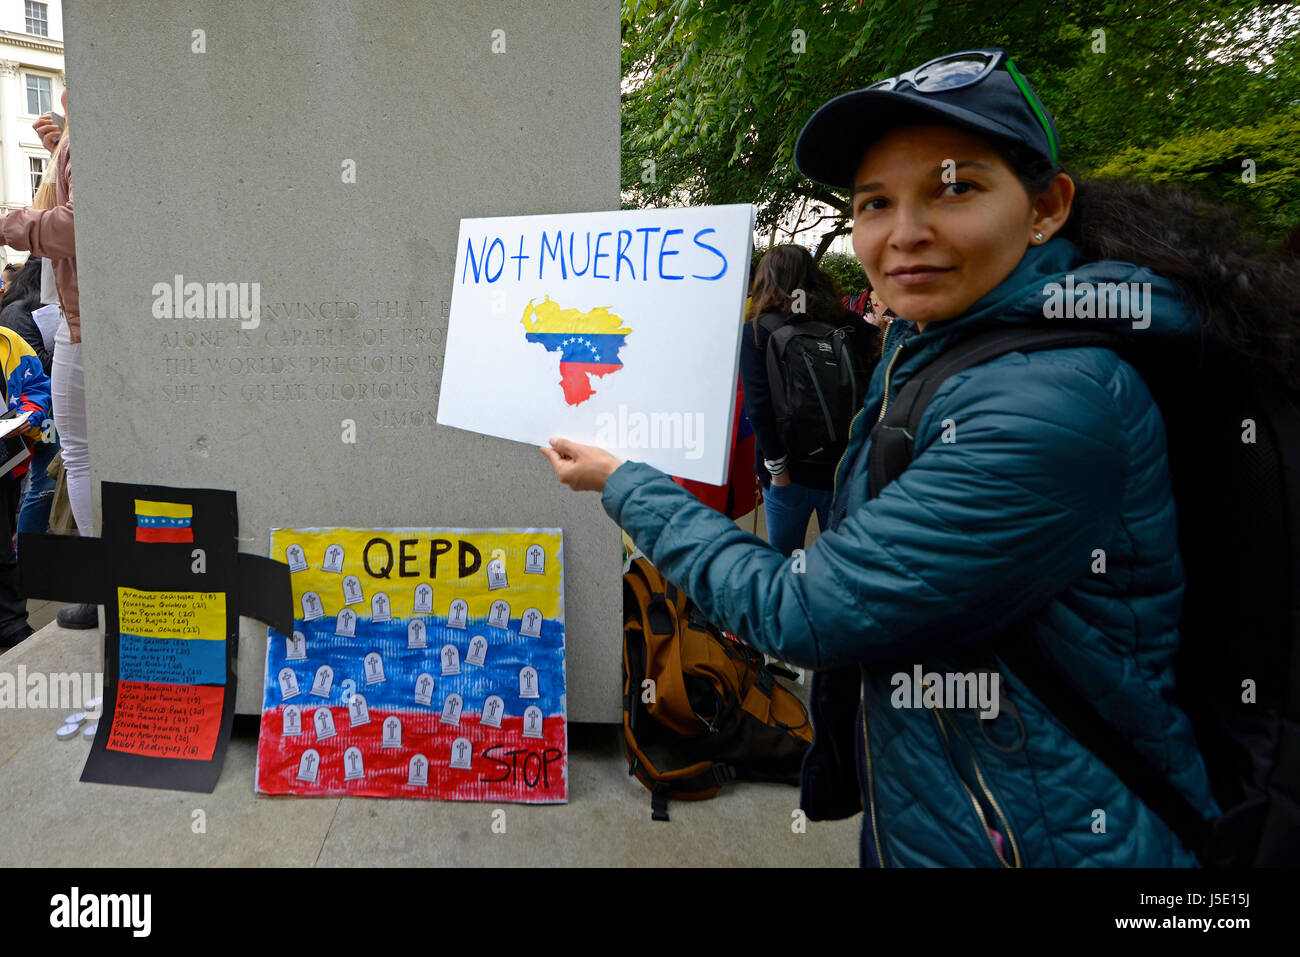 A demonstration protest against Venezuelan dictator Nicolas Maduro took place around the statue of Simon Bolivar - Stock Image